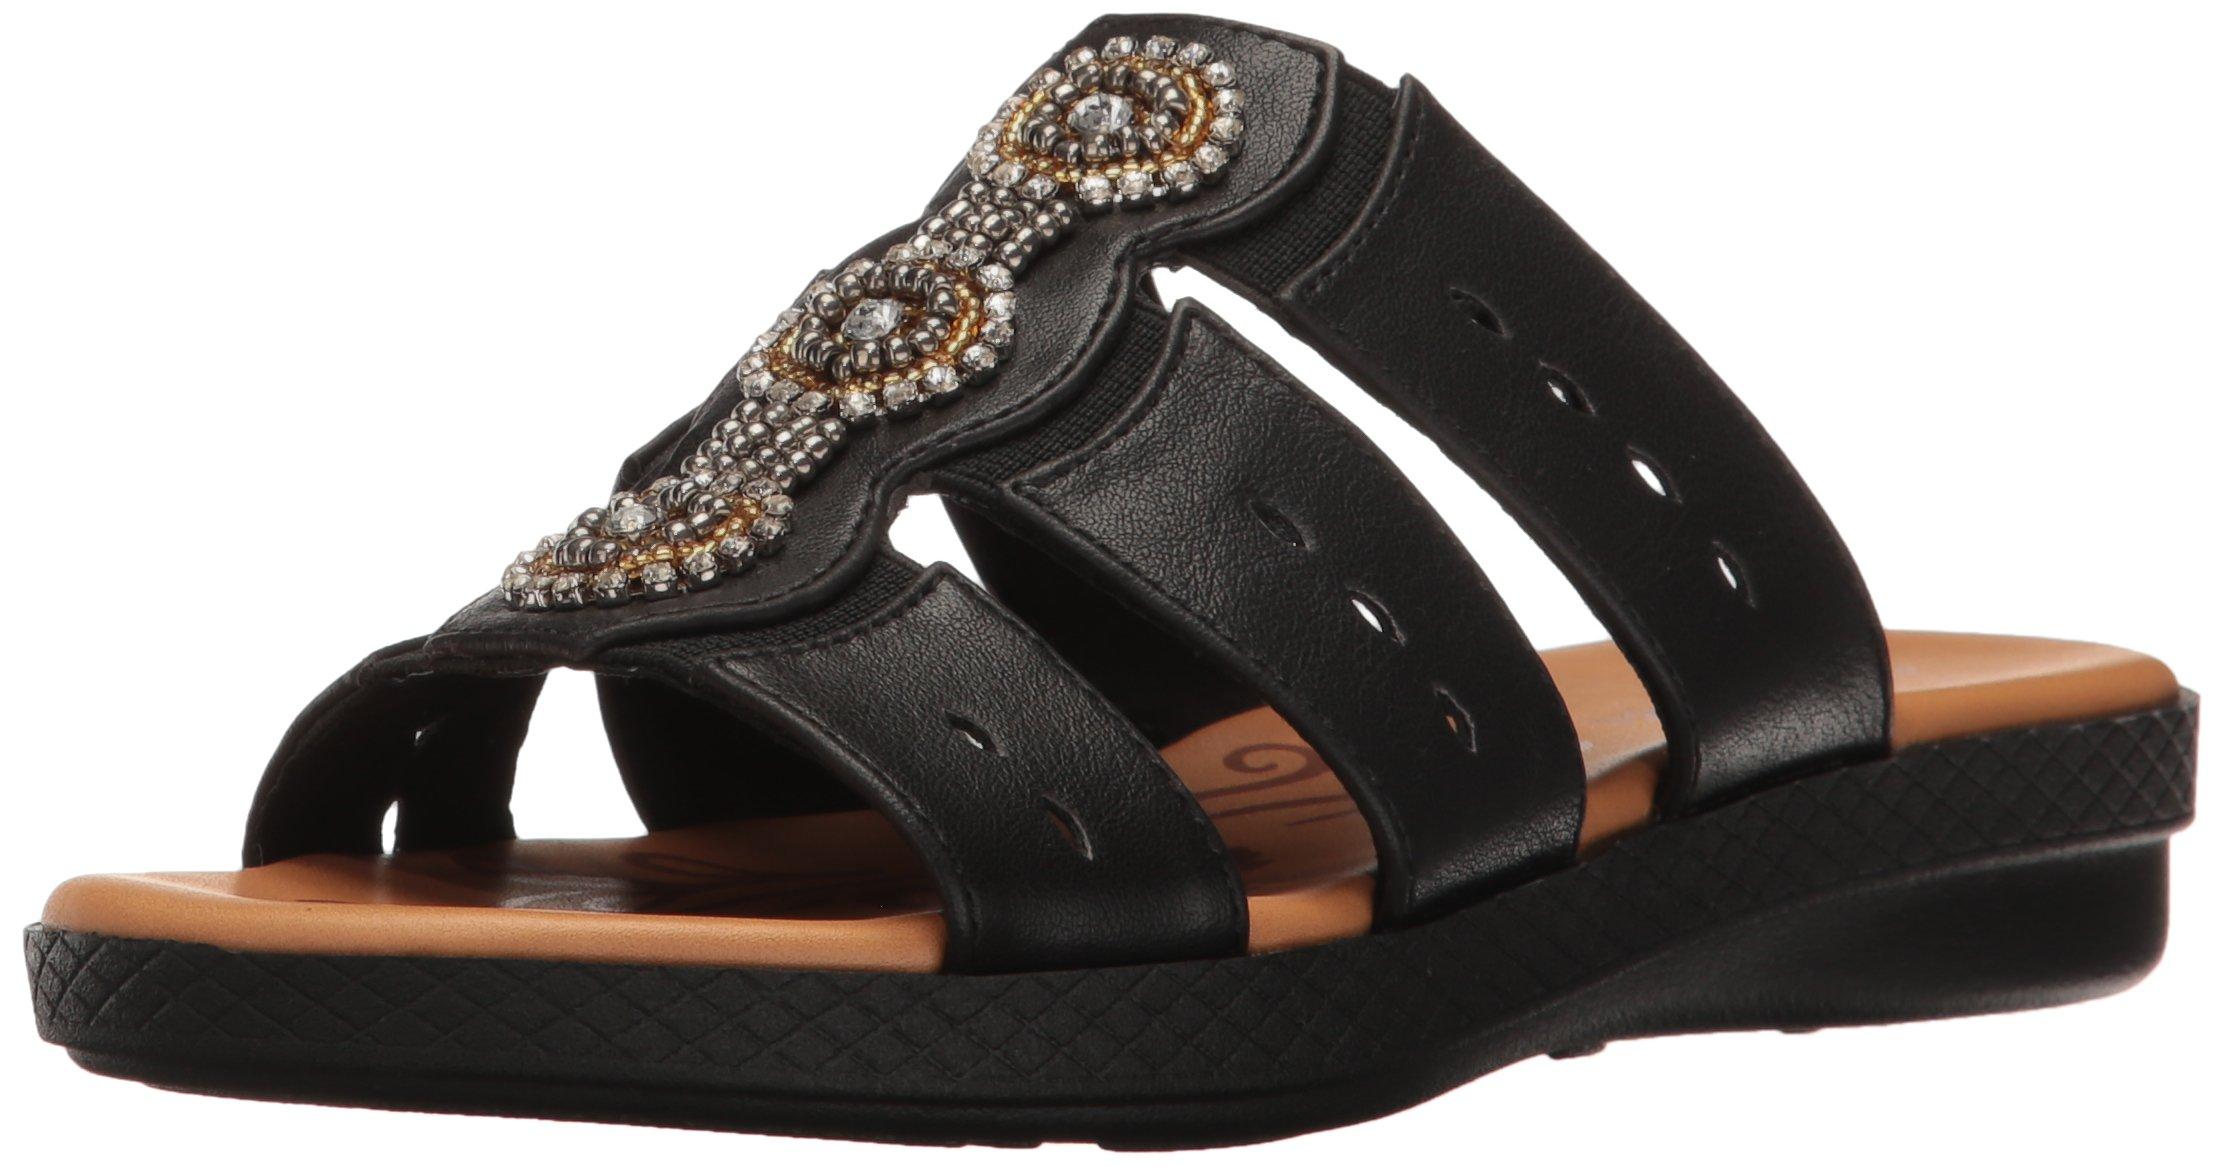 Easy Street Women's Nori Flat Sandal, Black, 12 M US